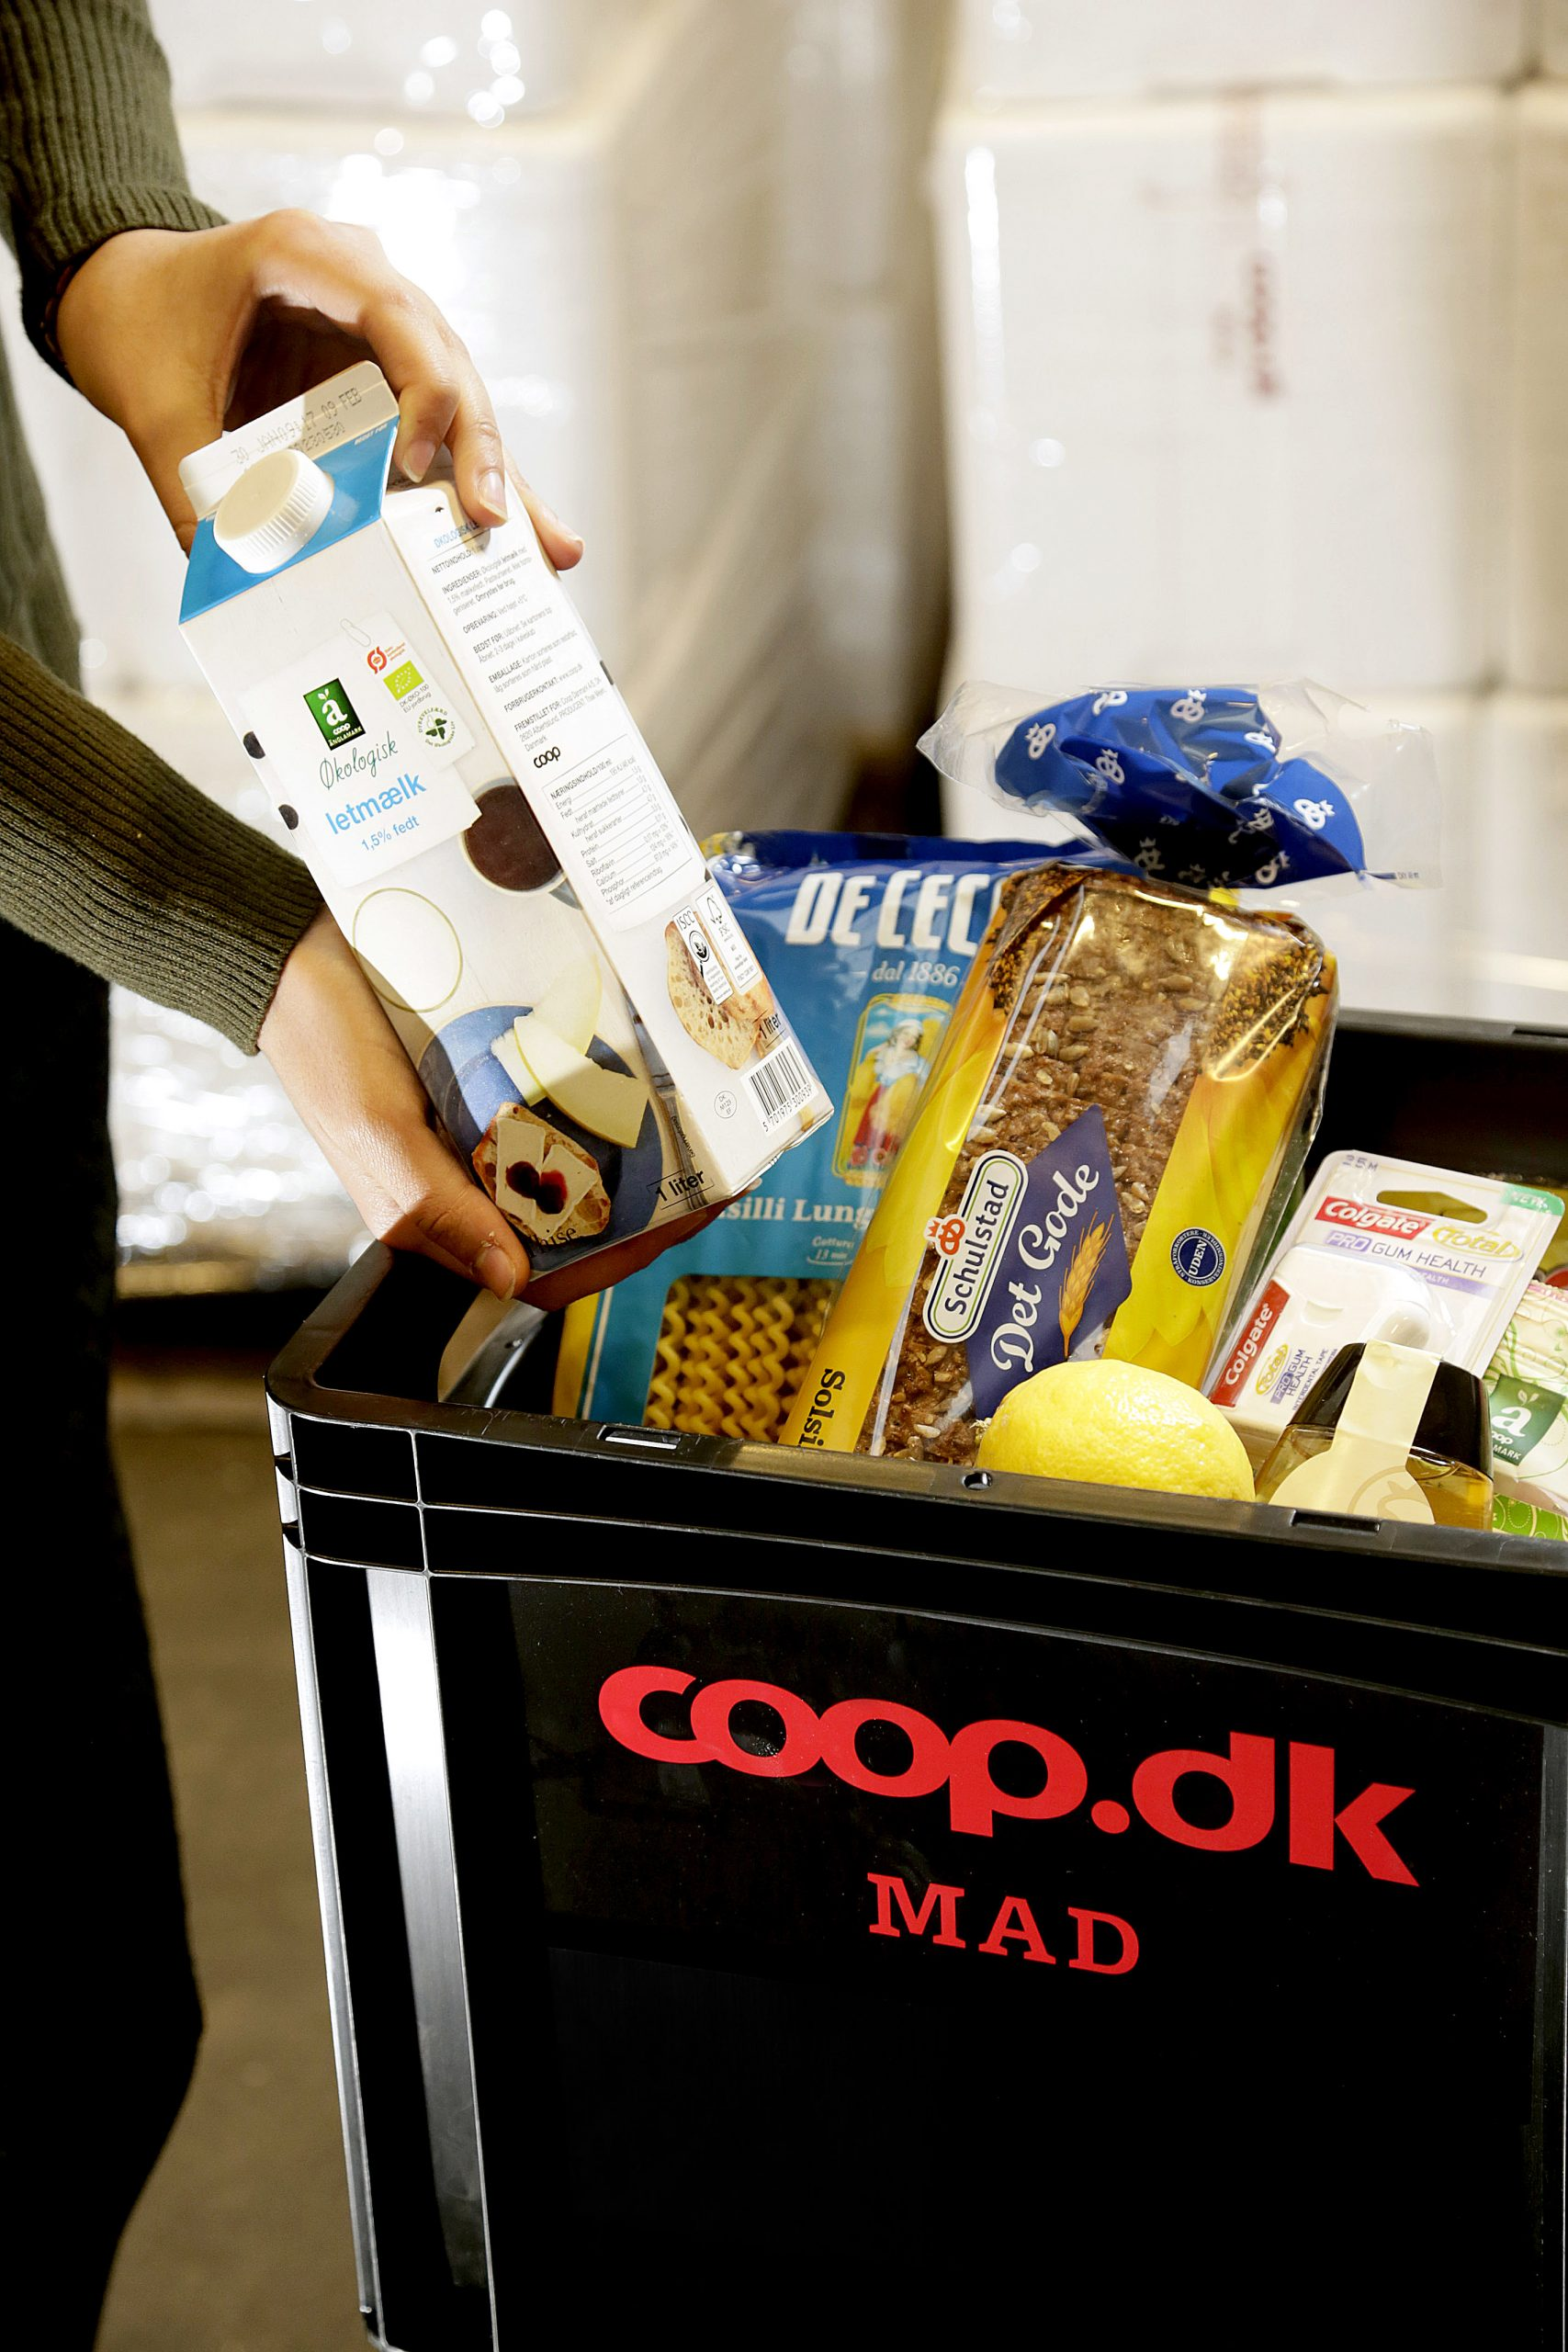 coop.dk, supermarked, coop, mad, online